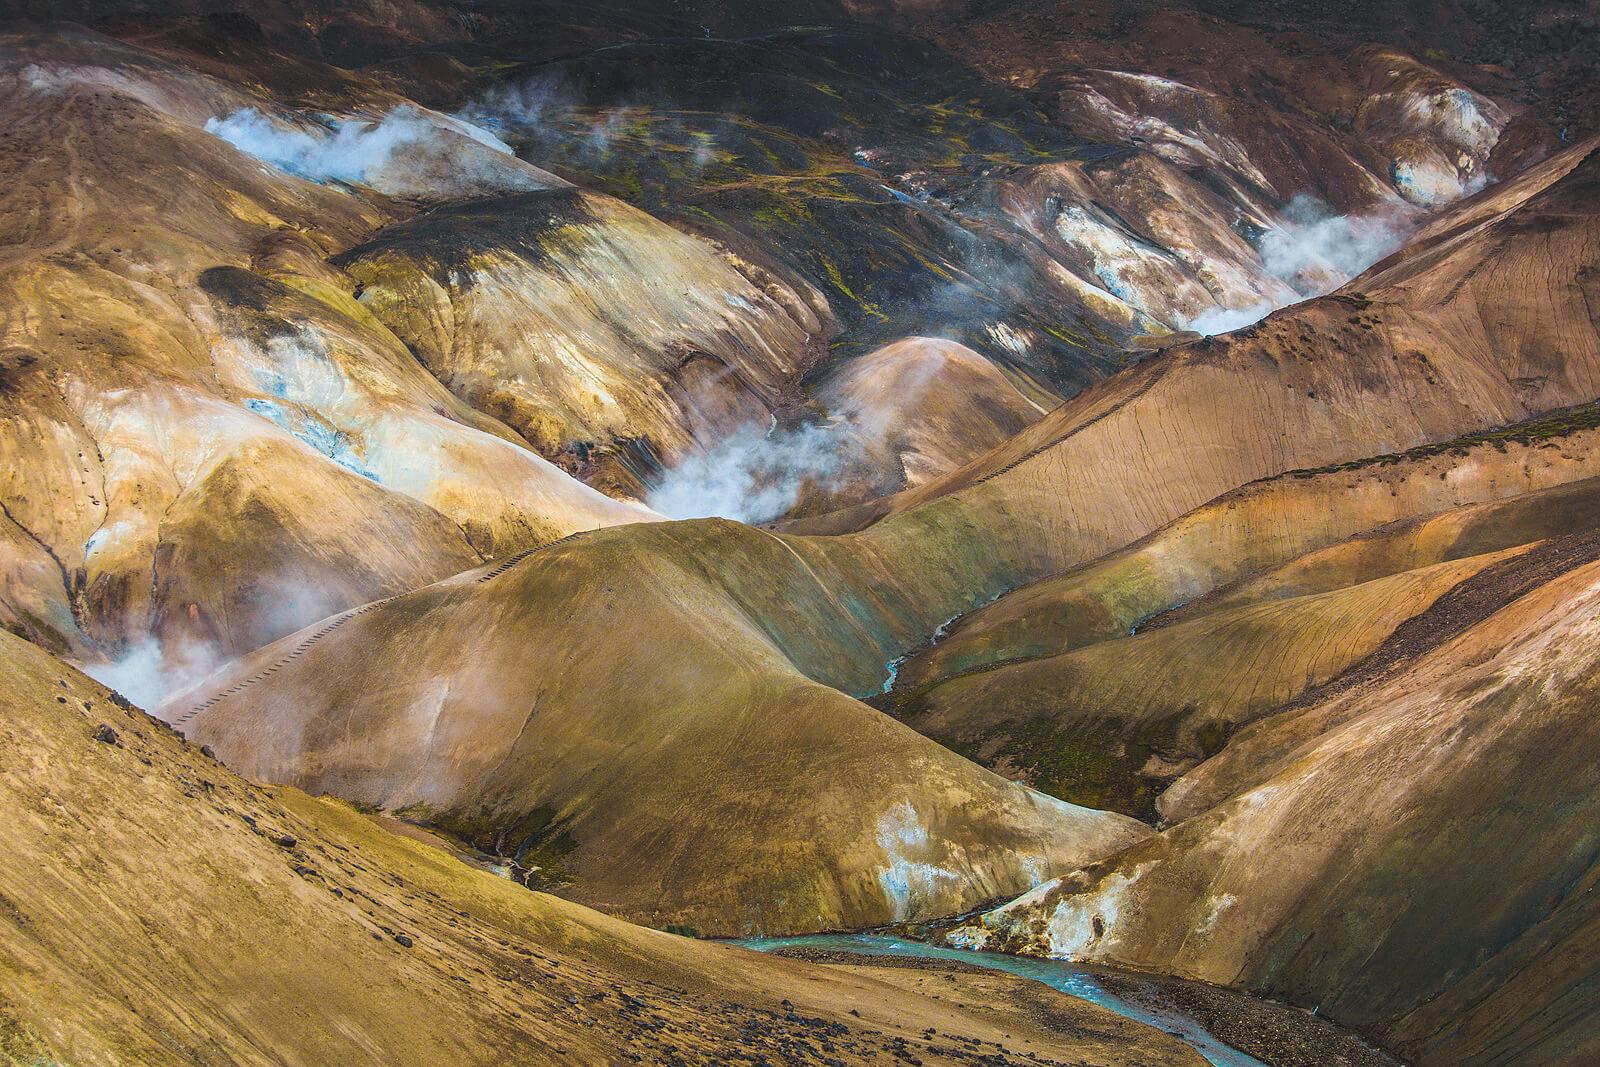 4-landscape_iceland_rohrbacher16_417